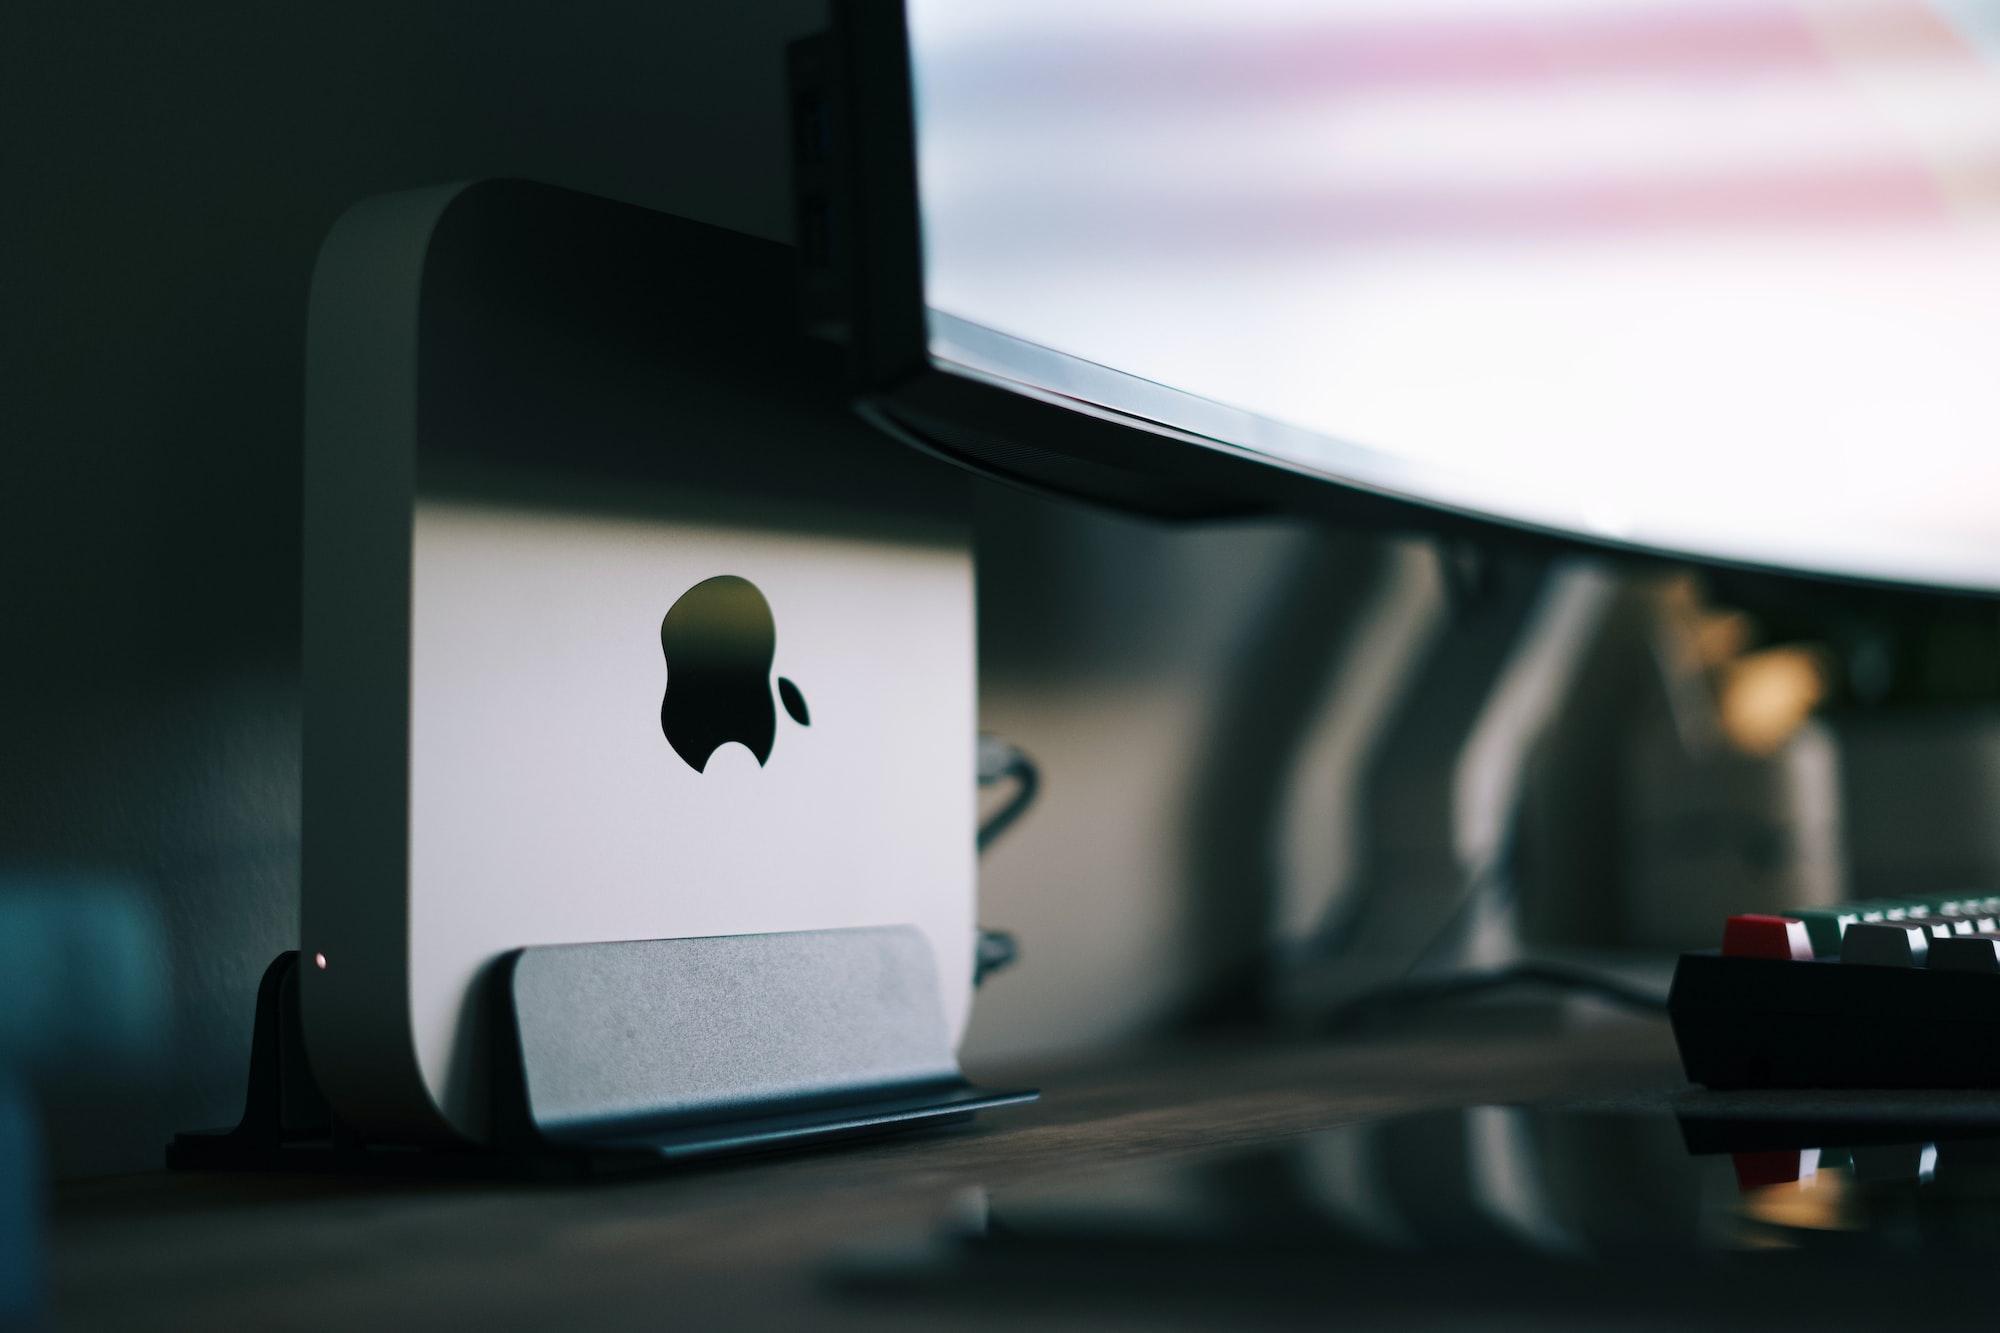 Mac mini M1 a new adventure!